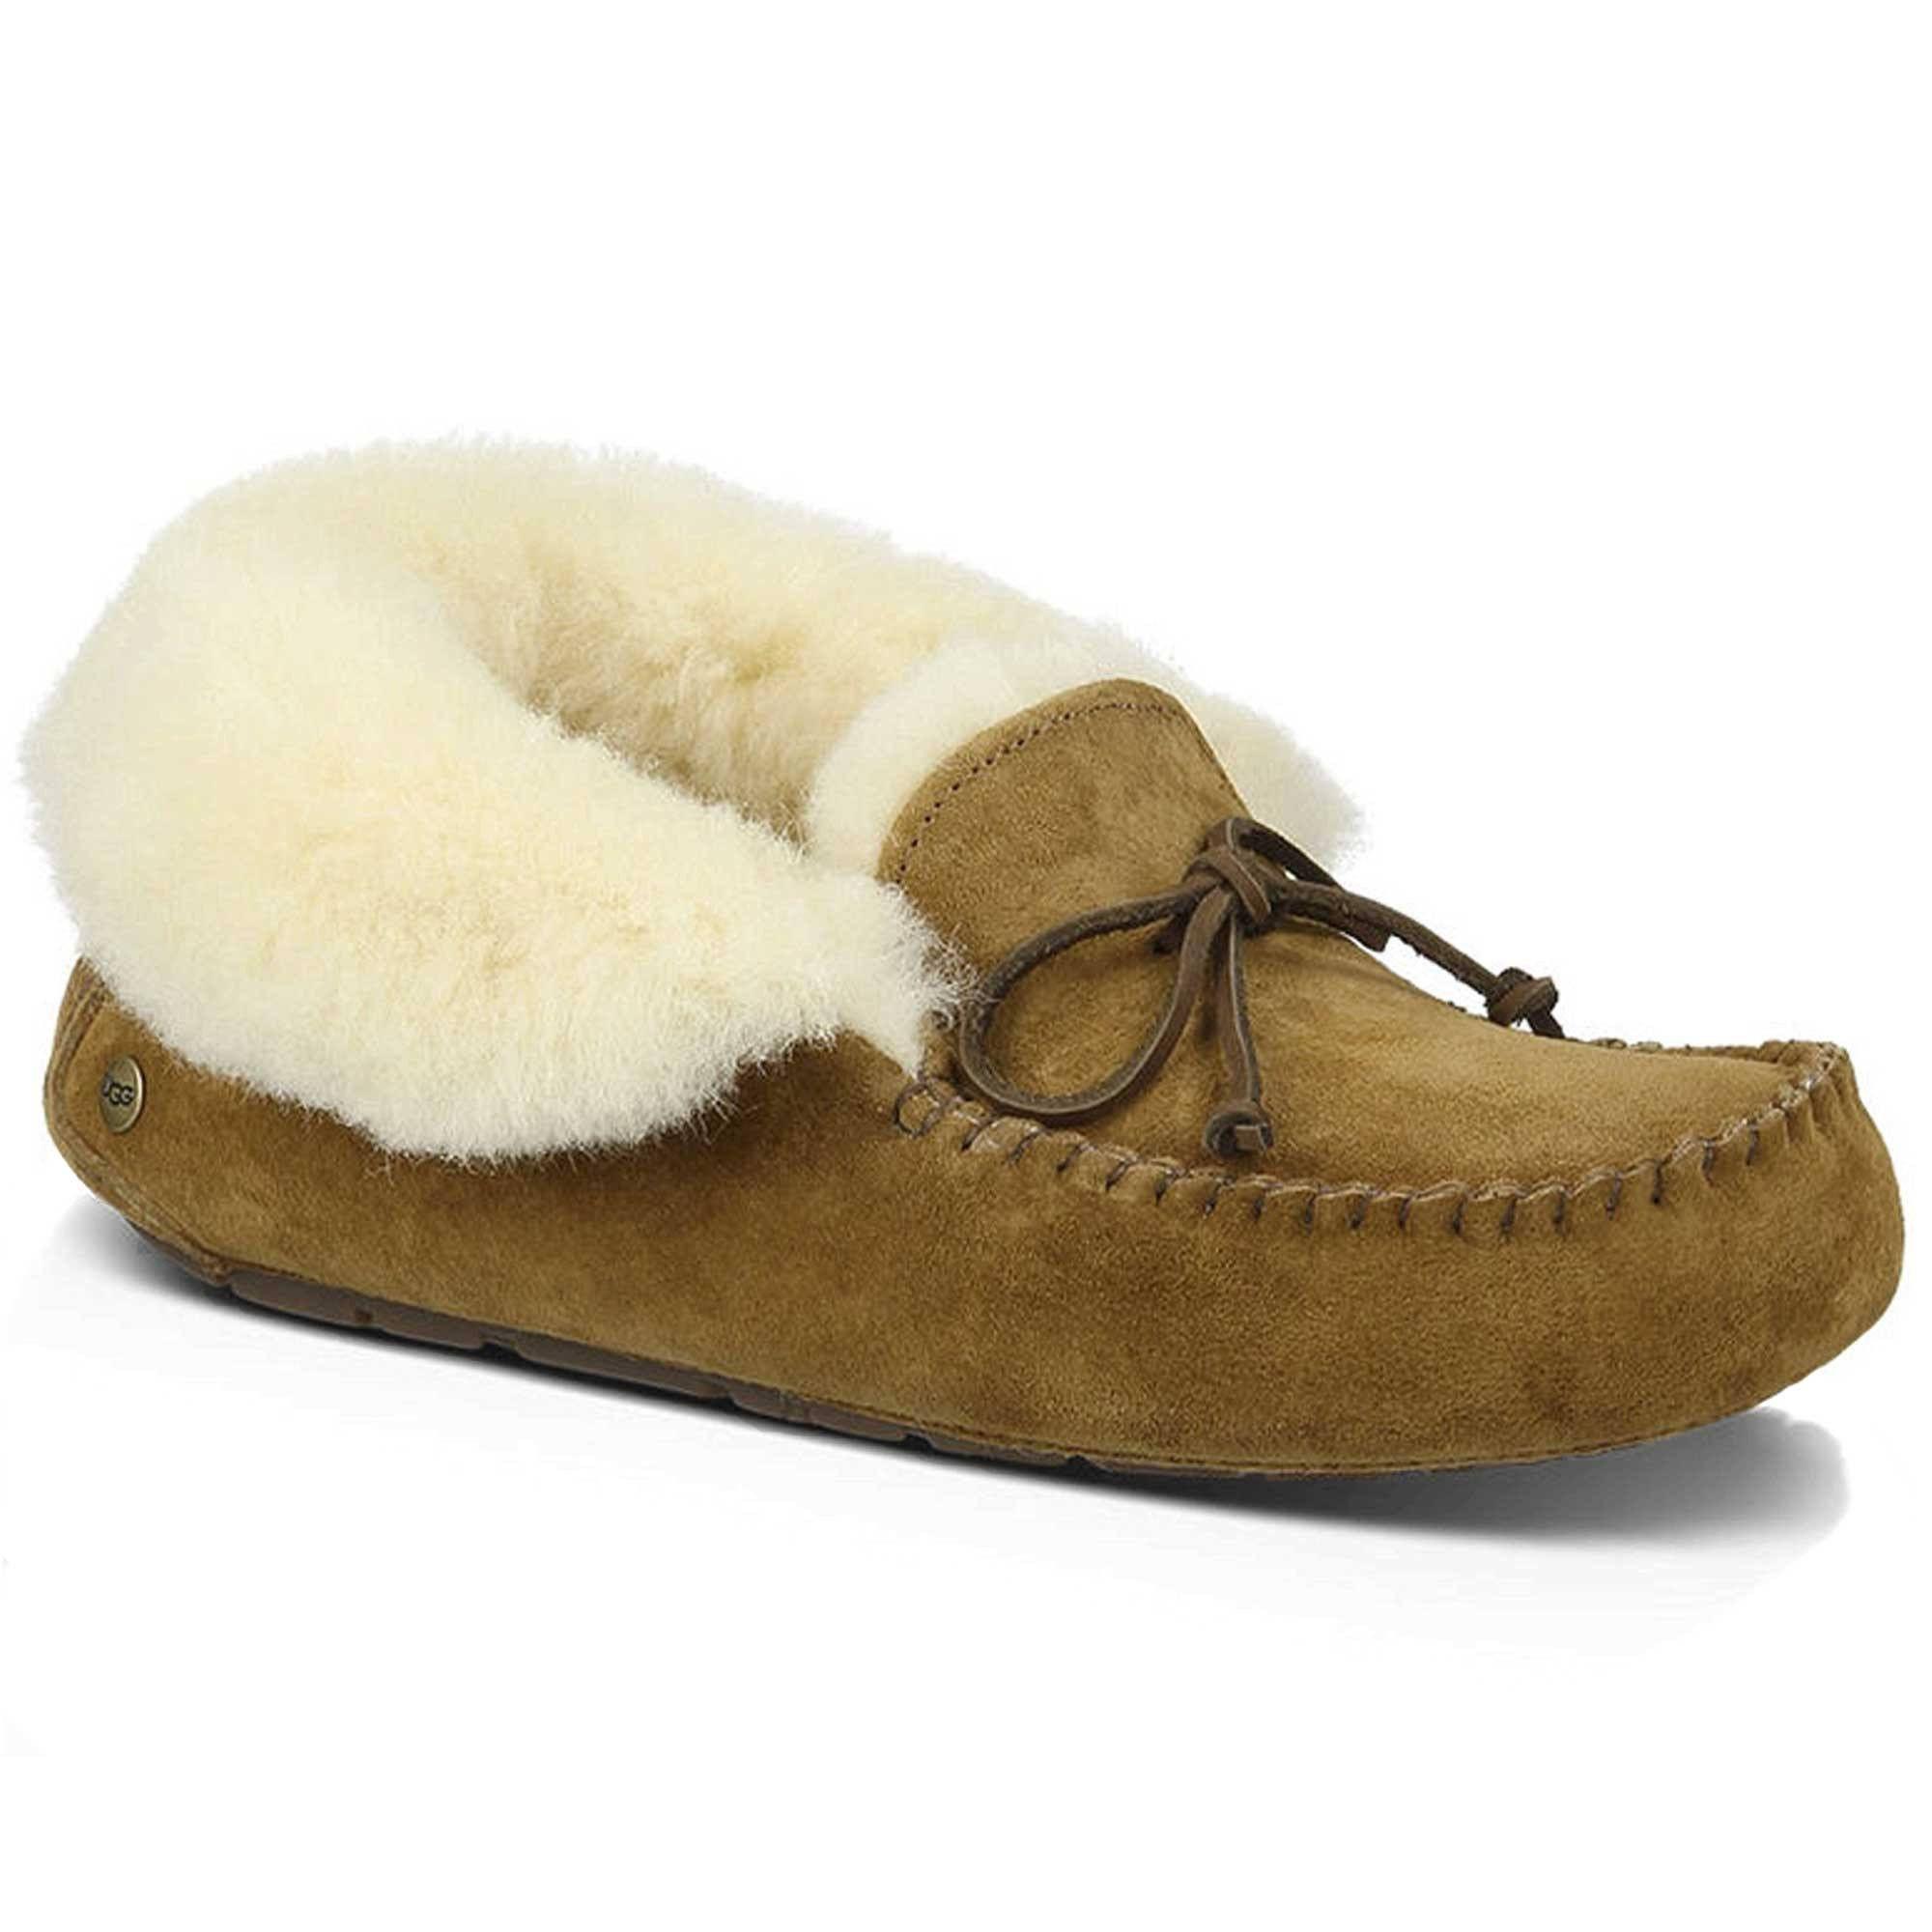 Ugg womenus alena slipper products